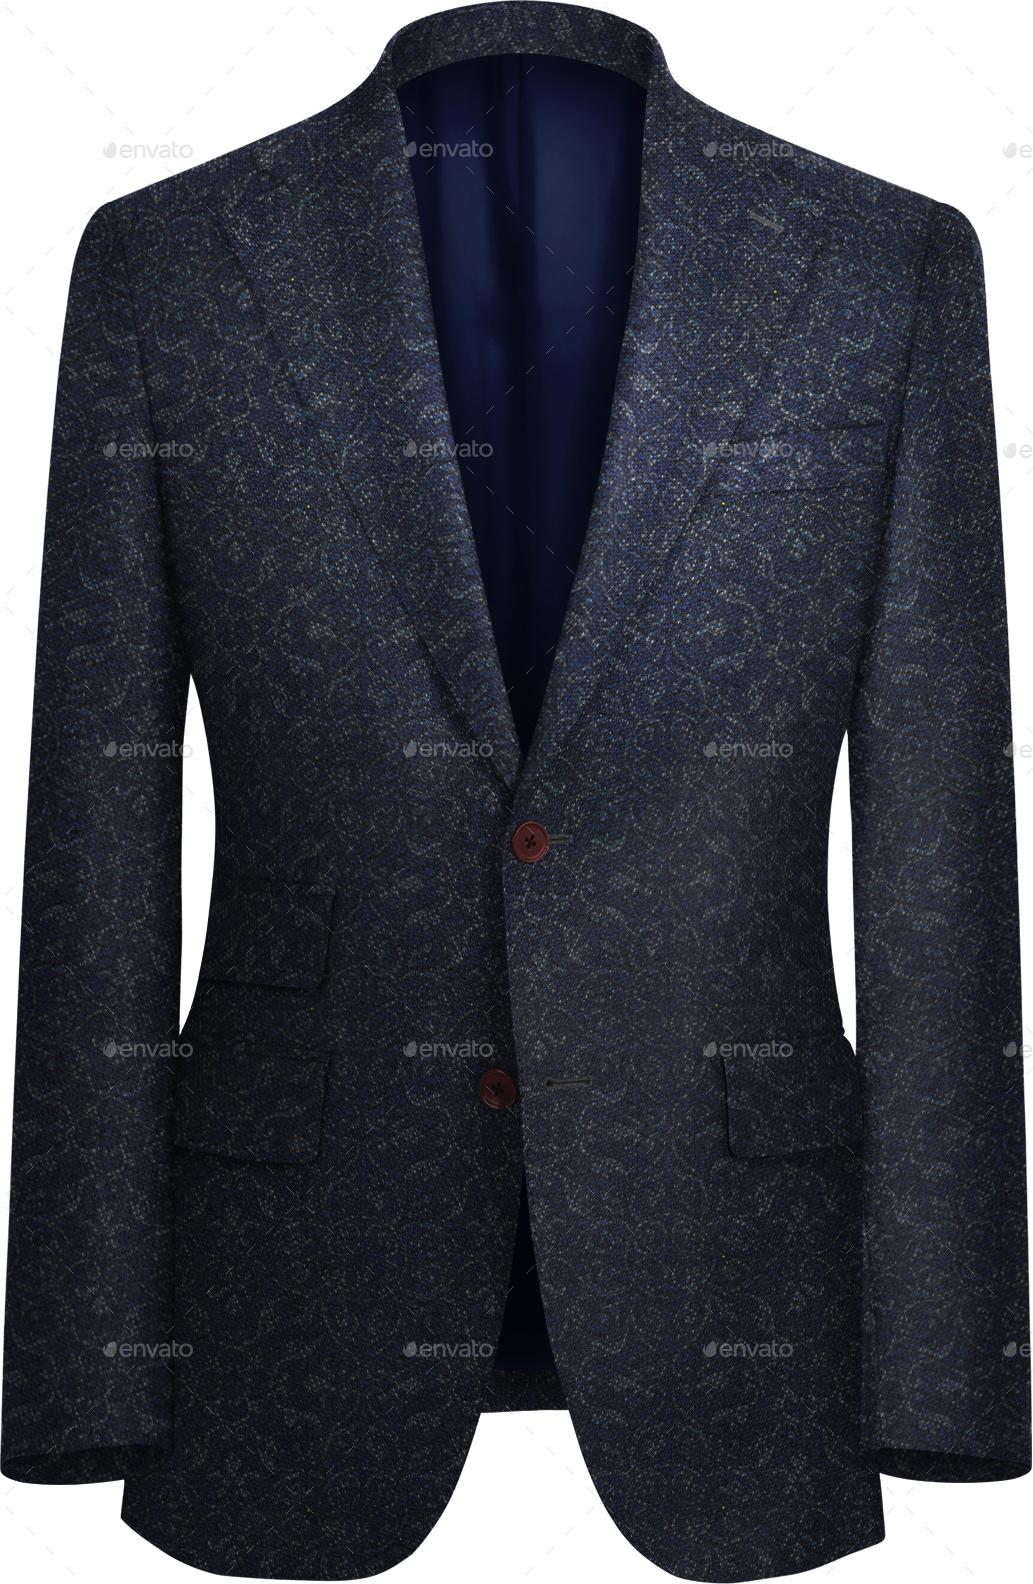 Jacket Mockup By Tojographics Graphicriver